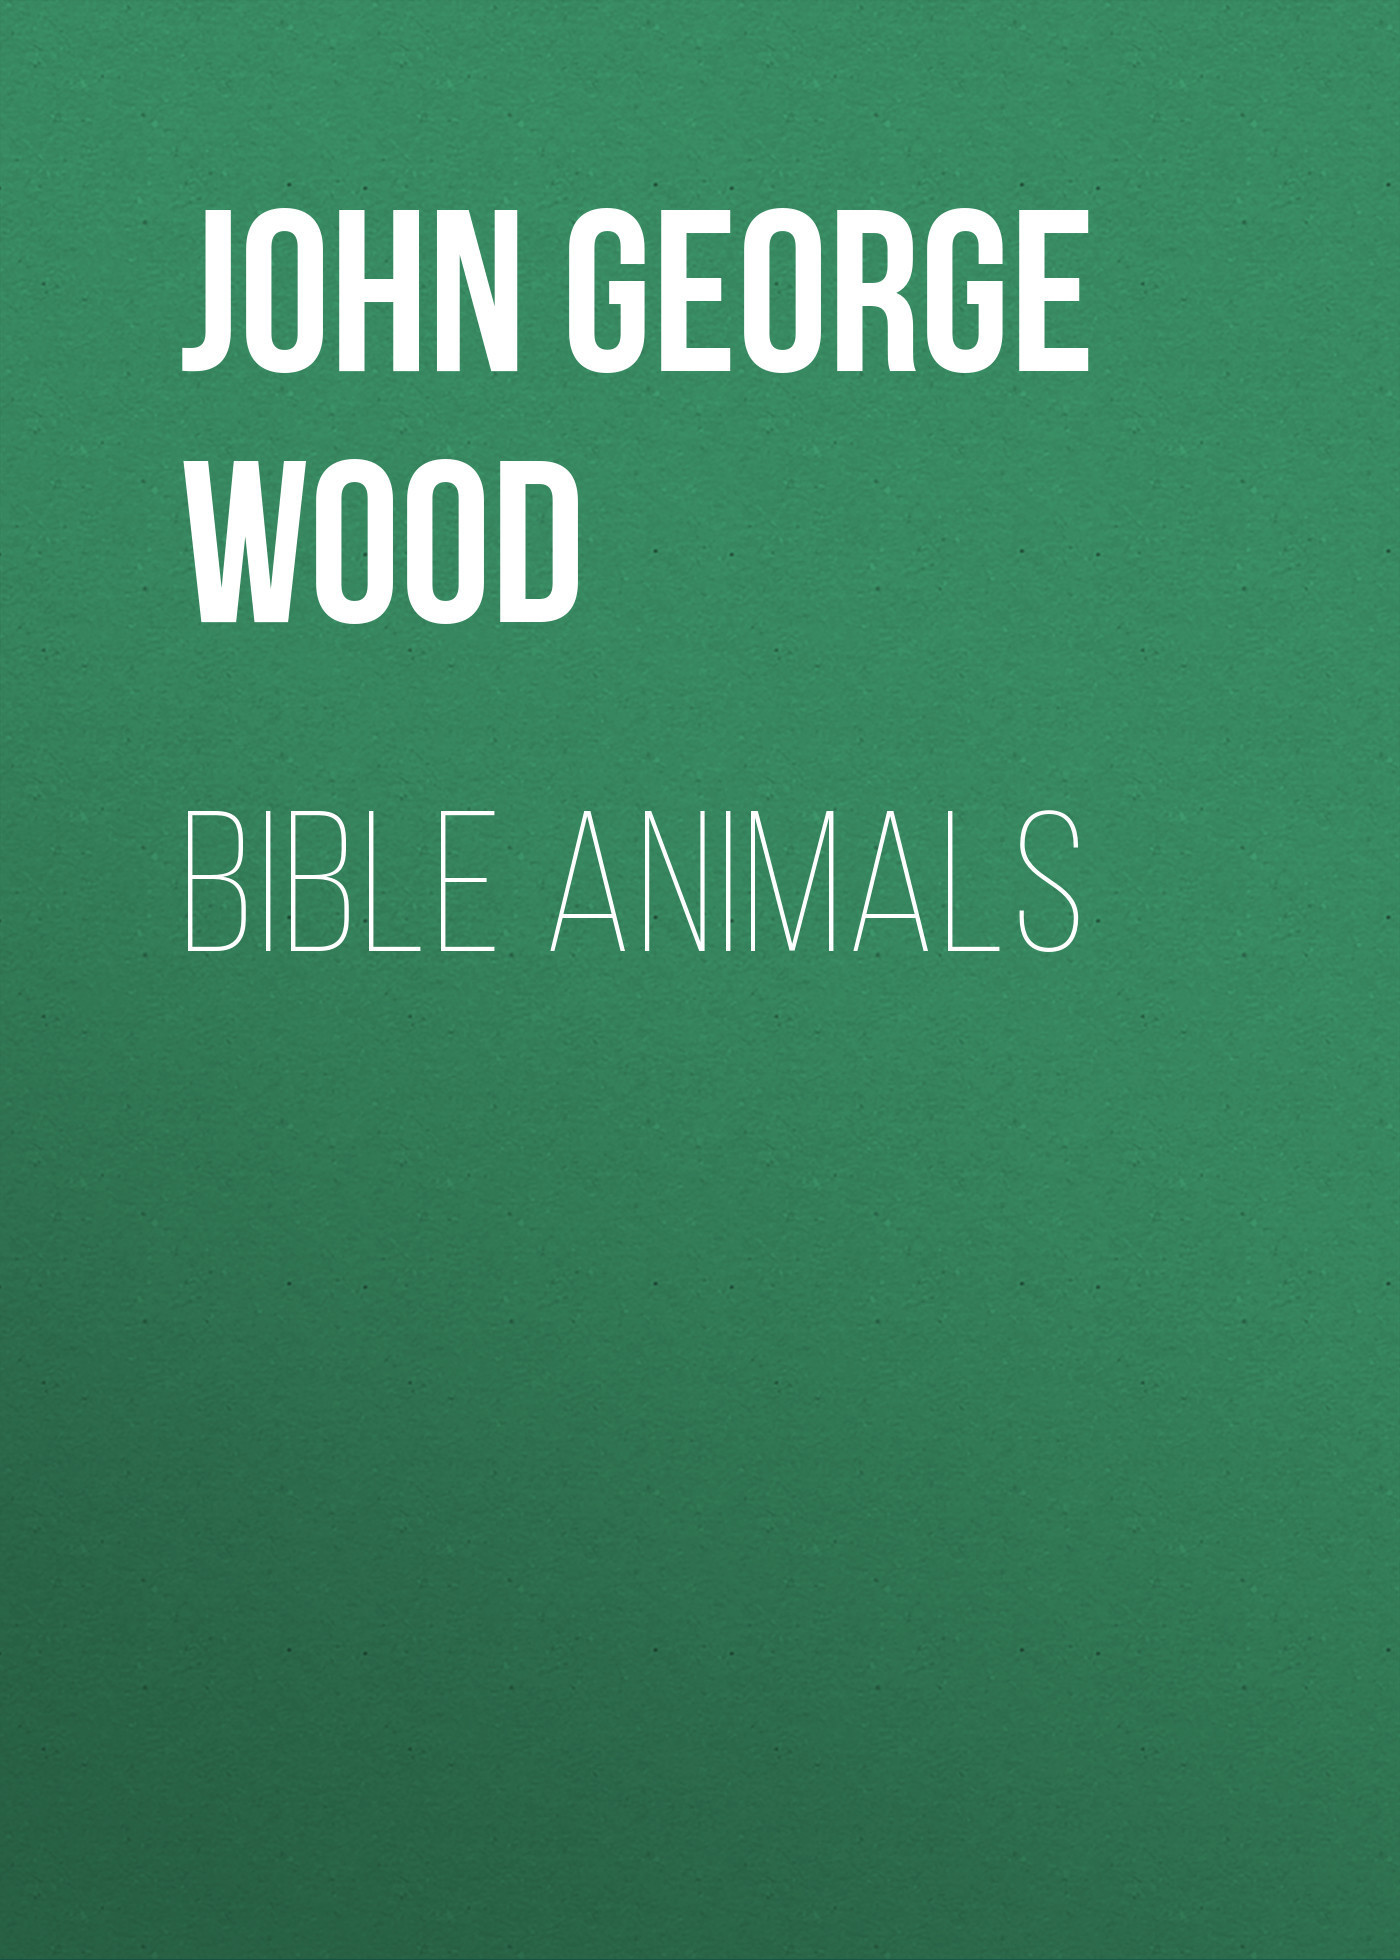 John George Wood Bible Animals